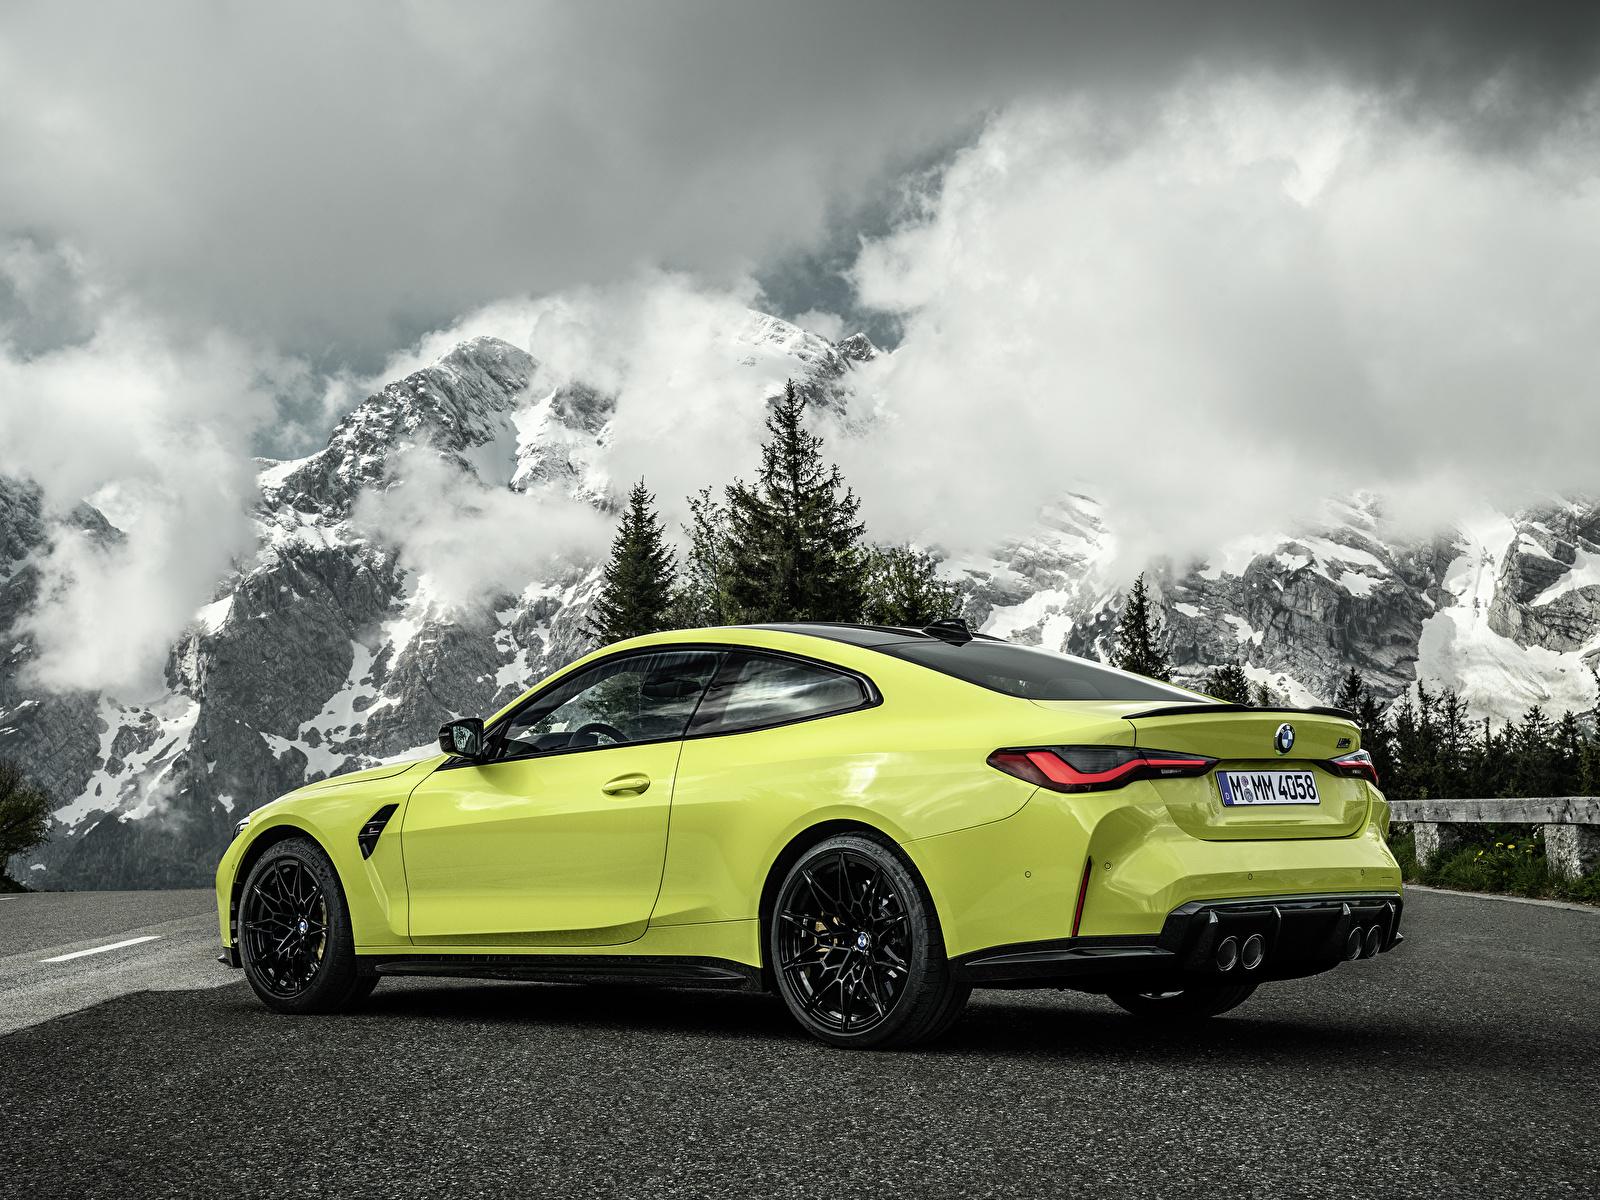 Картинки БМВ M4 Competition, (G82), 2020 Купе гора Природа Металлик автомобиль облачно 1600x1200 BMW Горы авто машины машина Автомобили Облака облако